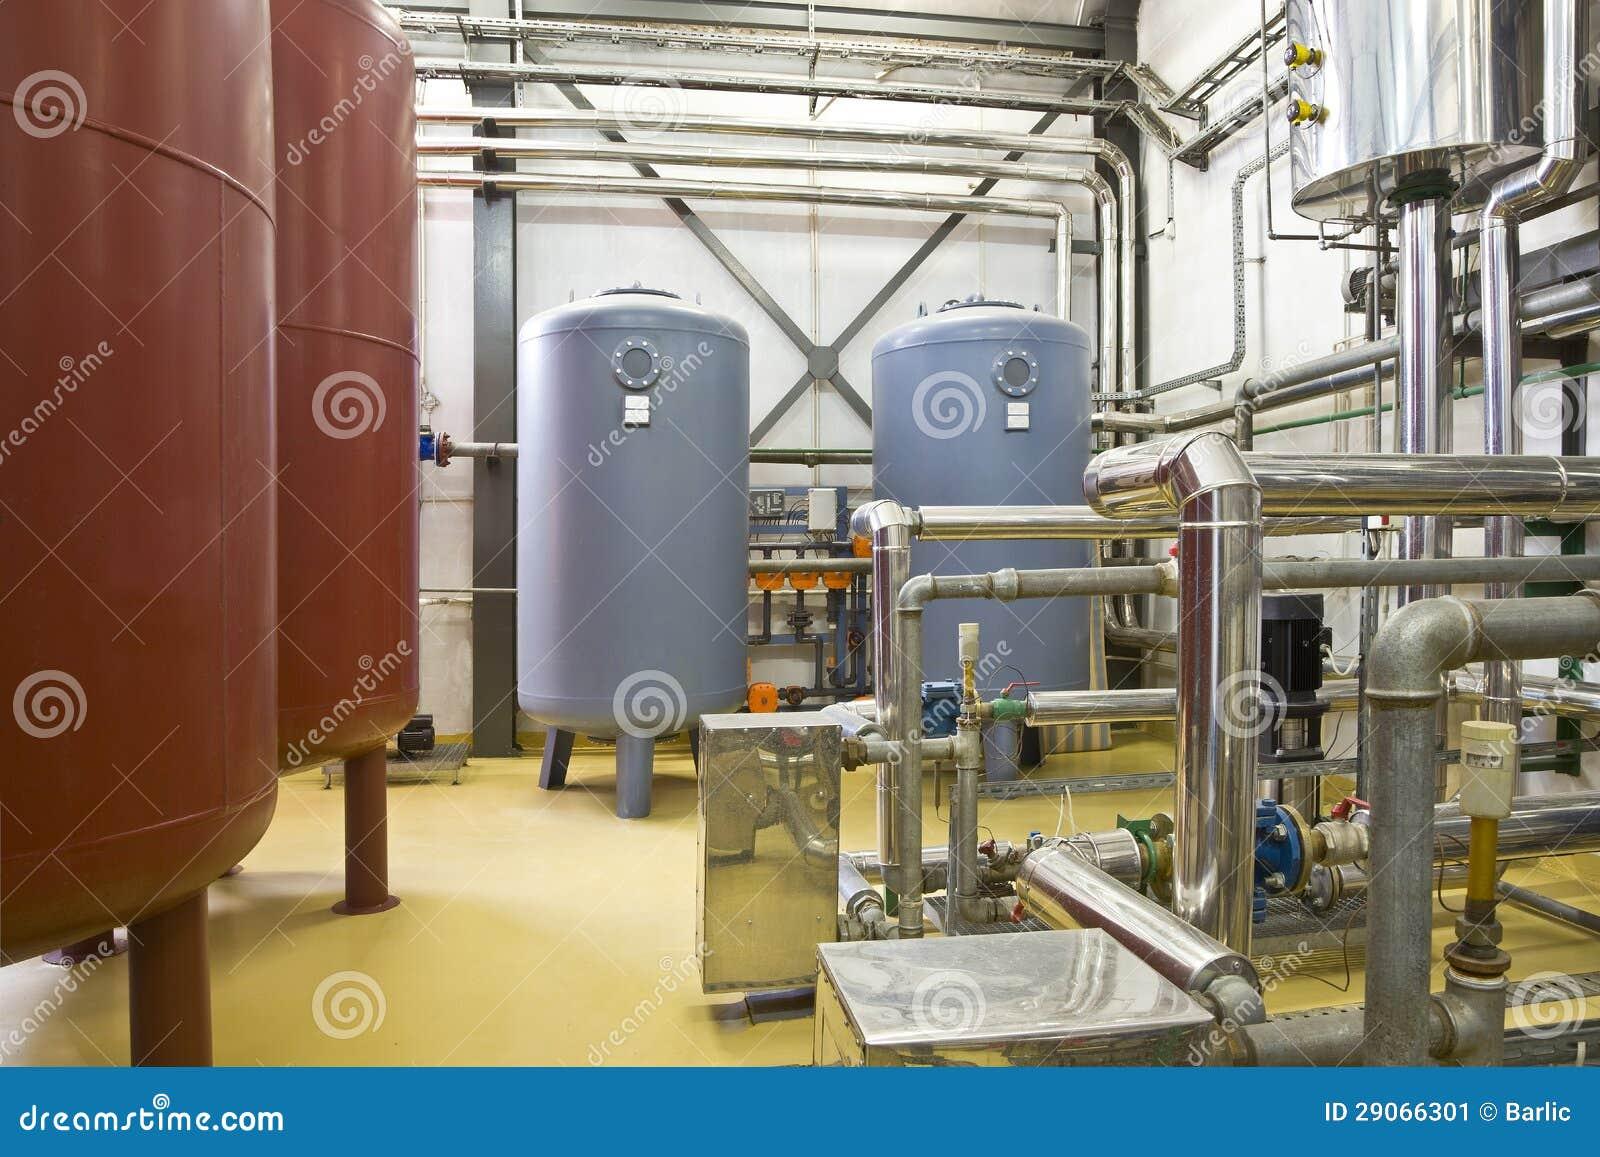 Wiring Diagram Honeywell S Plan Wiring Diagram Plan Central Heating